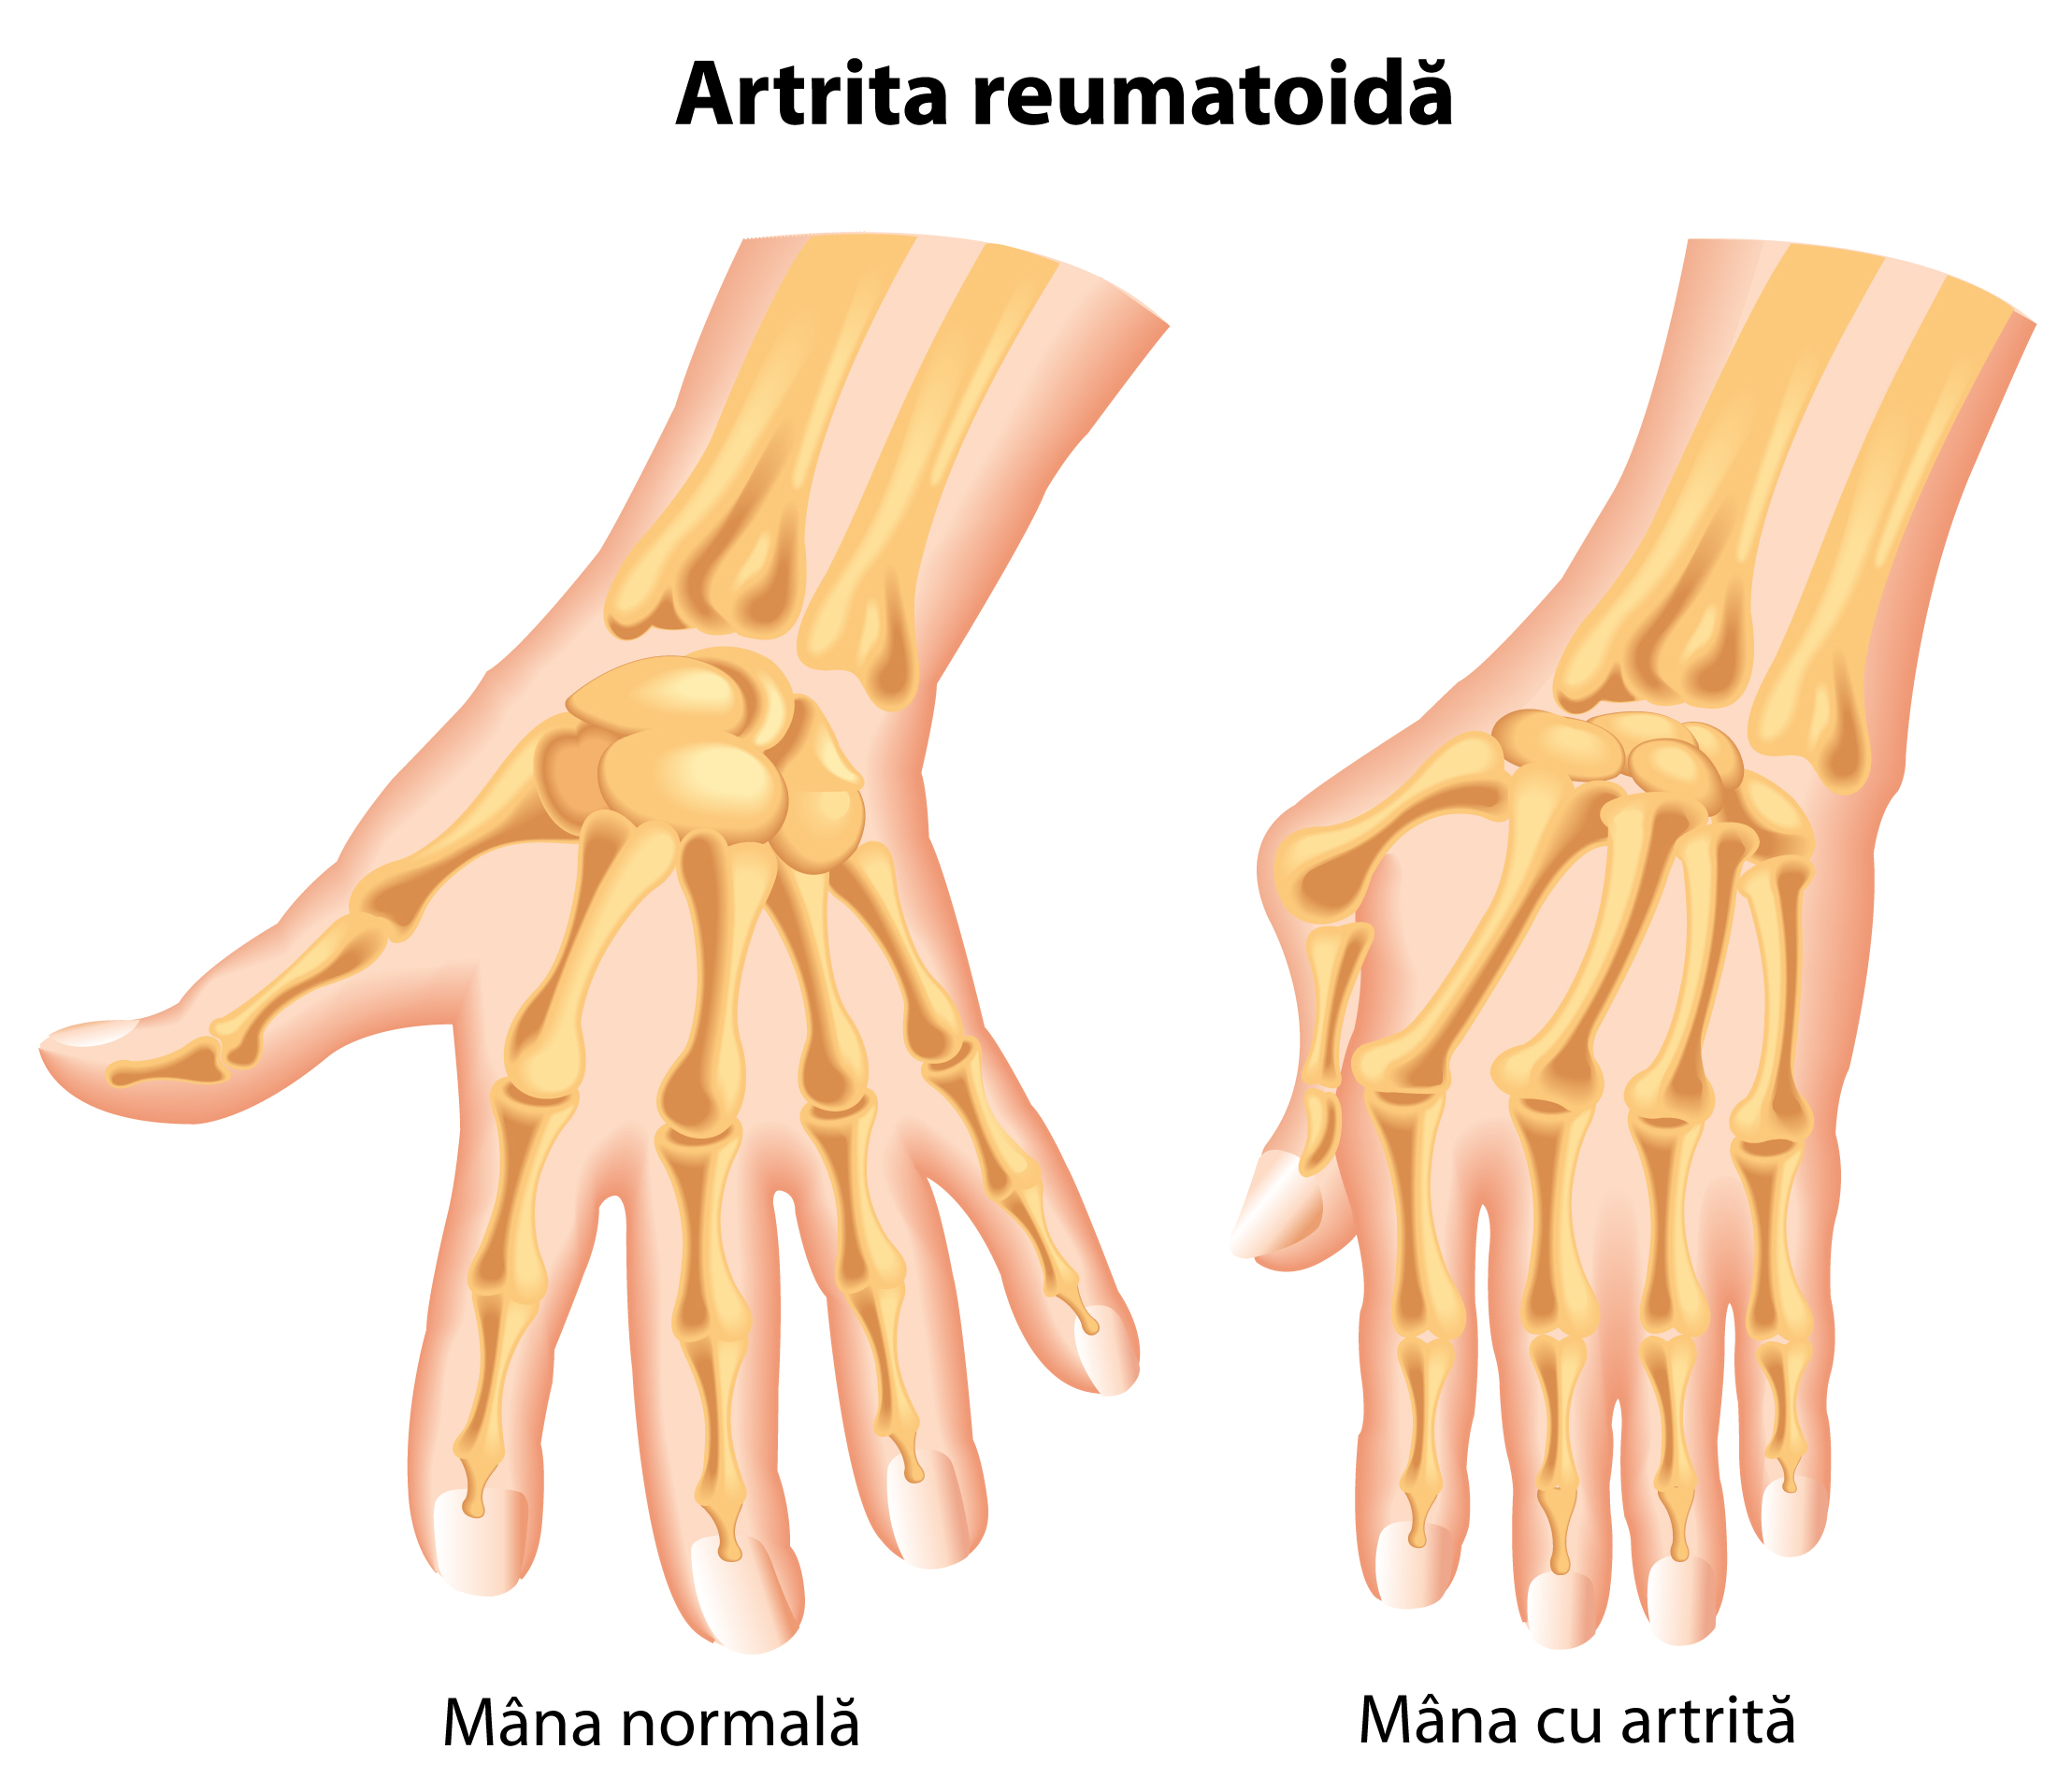 Poliartrita reumatoida: fara tratament, degetele mainilor se deformeaza semnificativ!